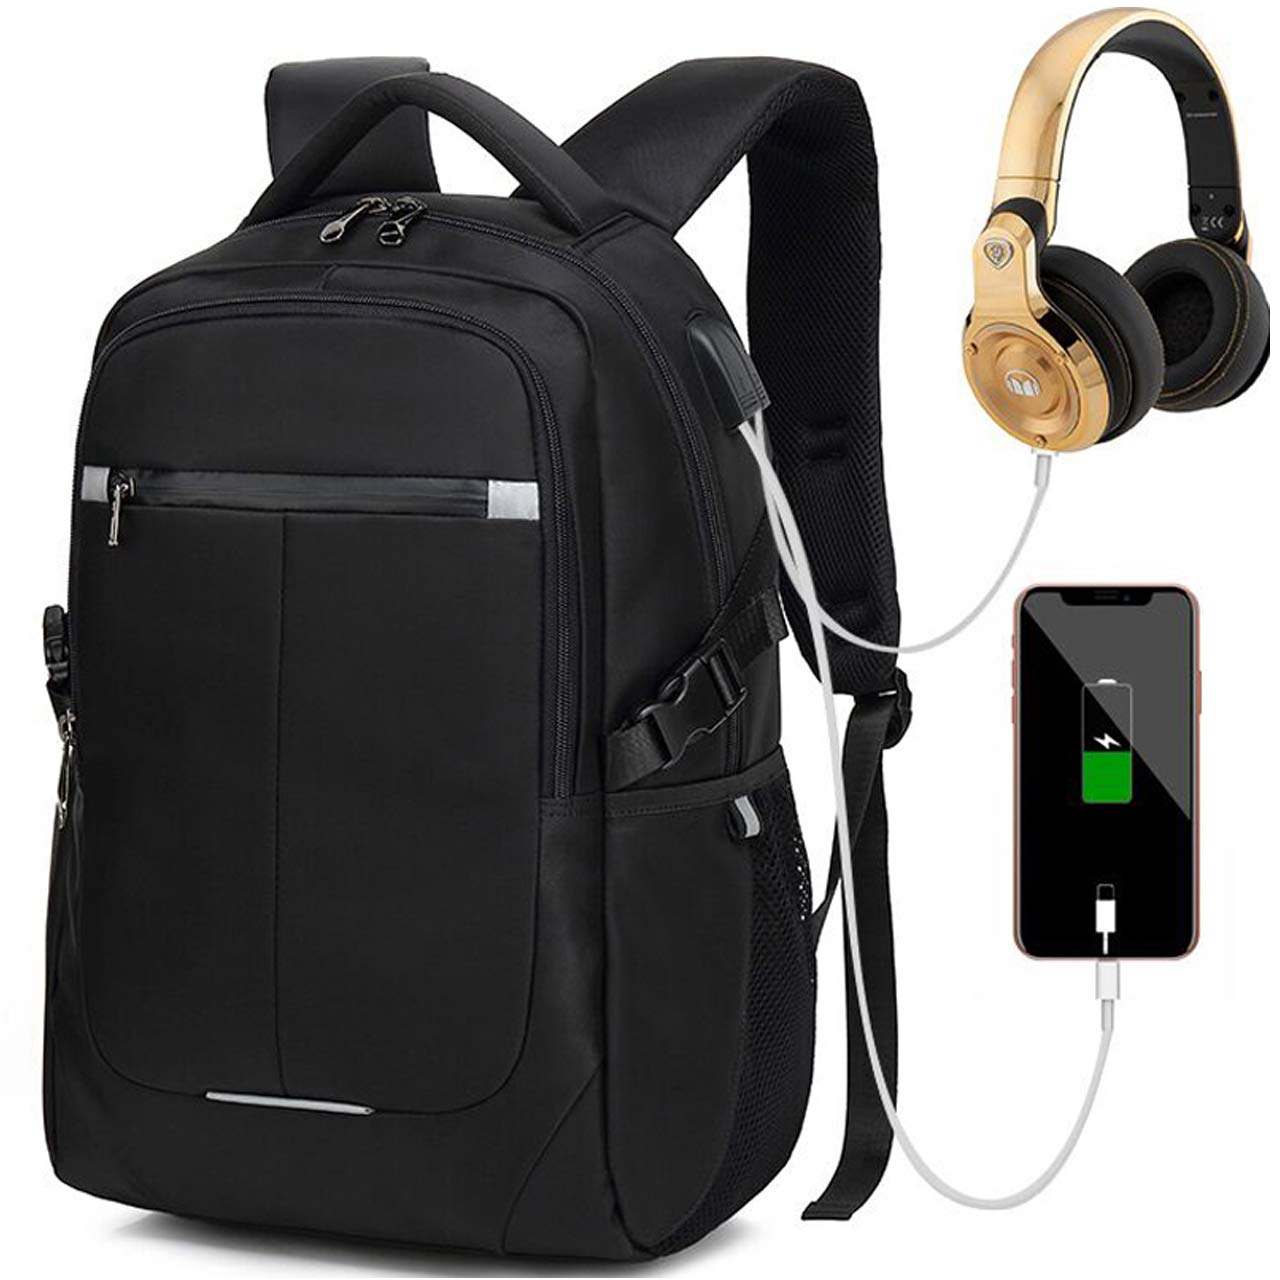 Kriture Laptop Backpack Men Women Business Travel Slim 15.6 Computer Bag with USB Charging and Earphone Port, Water Resistant Computer Backpacks for College School Student Bookbag, Black